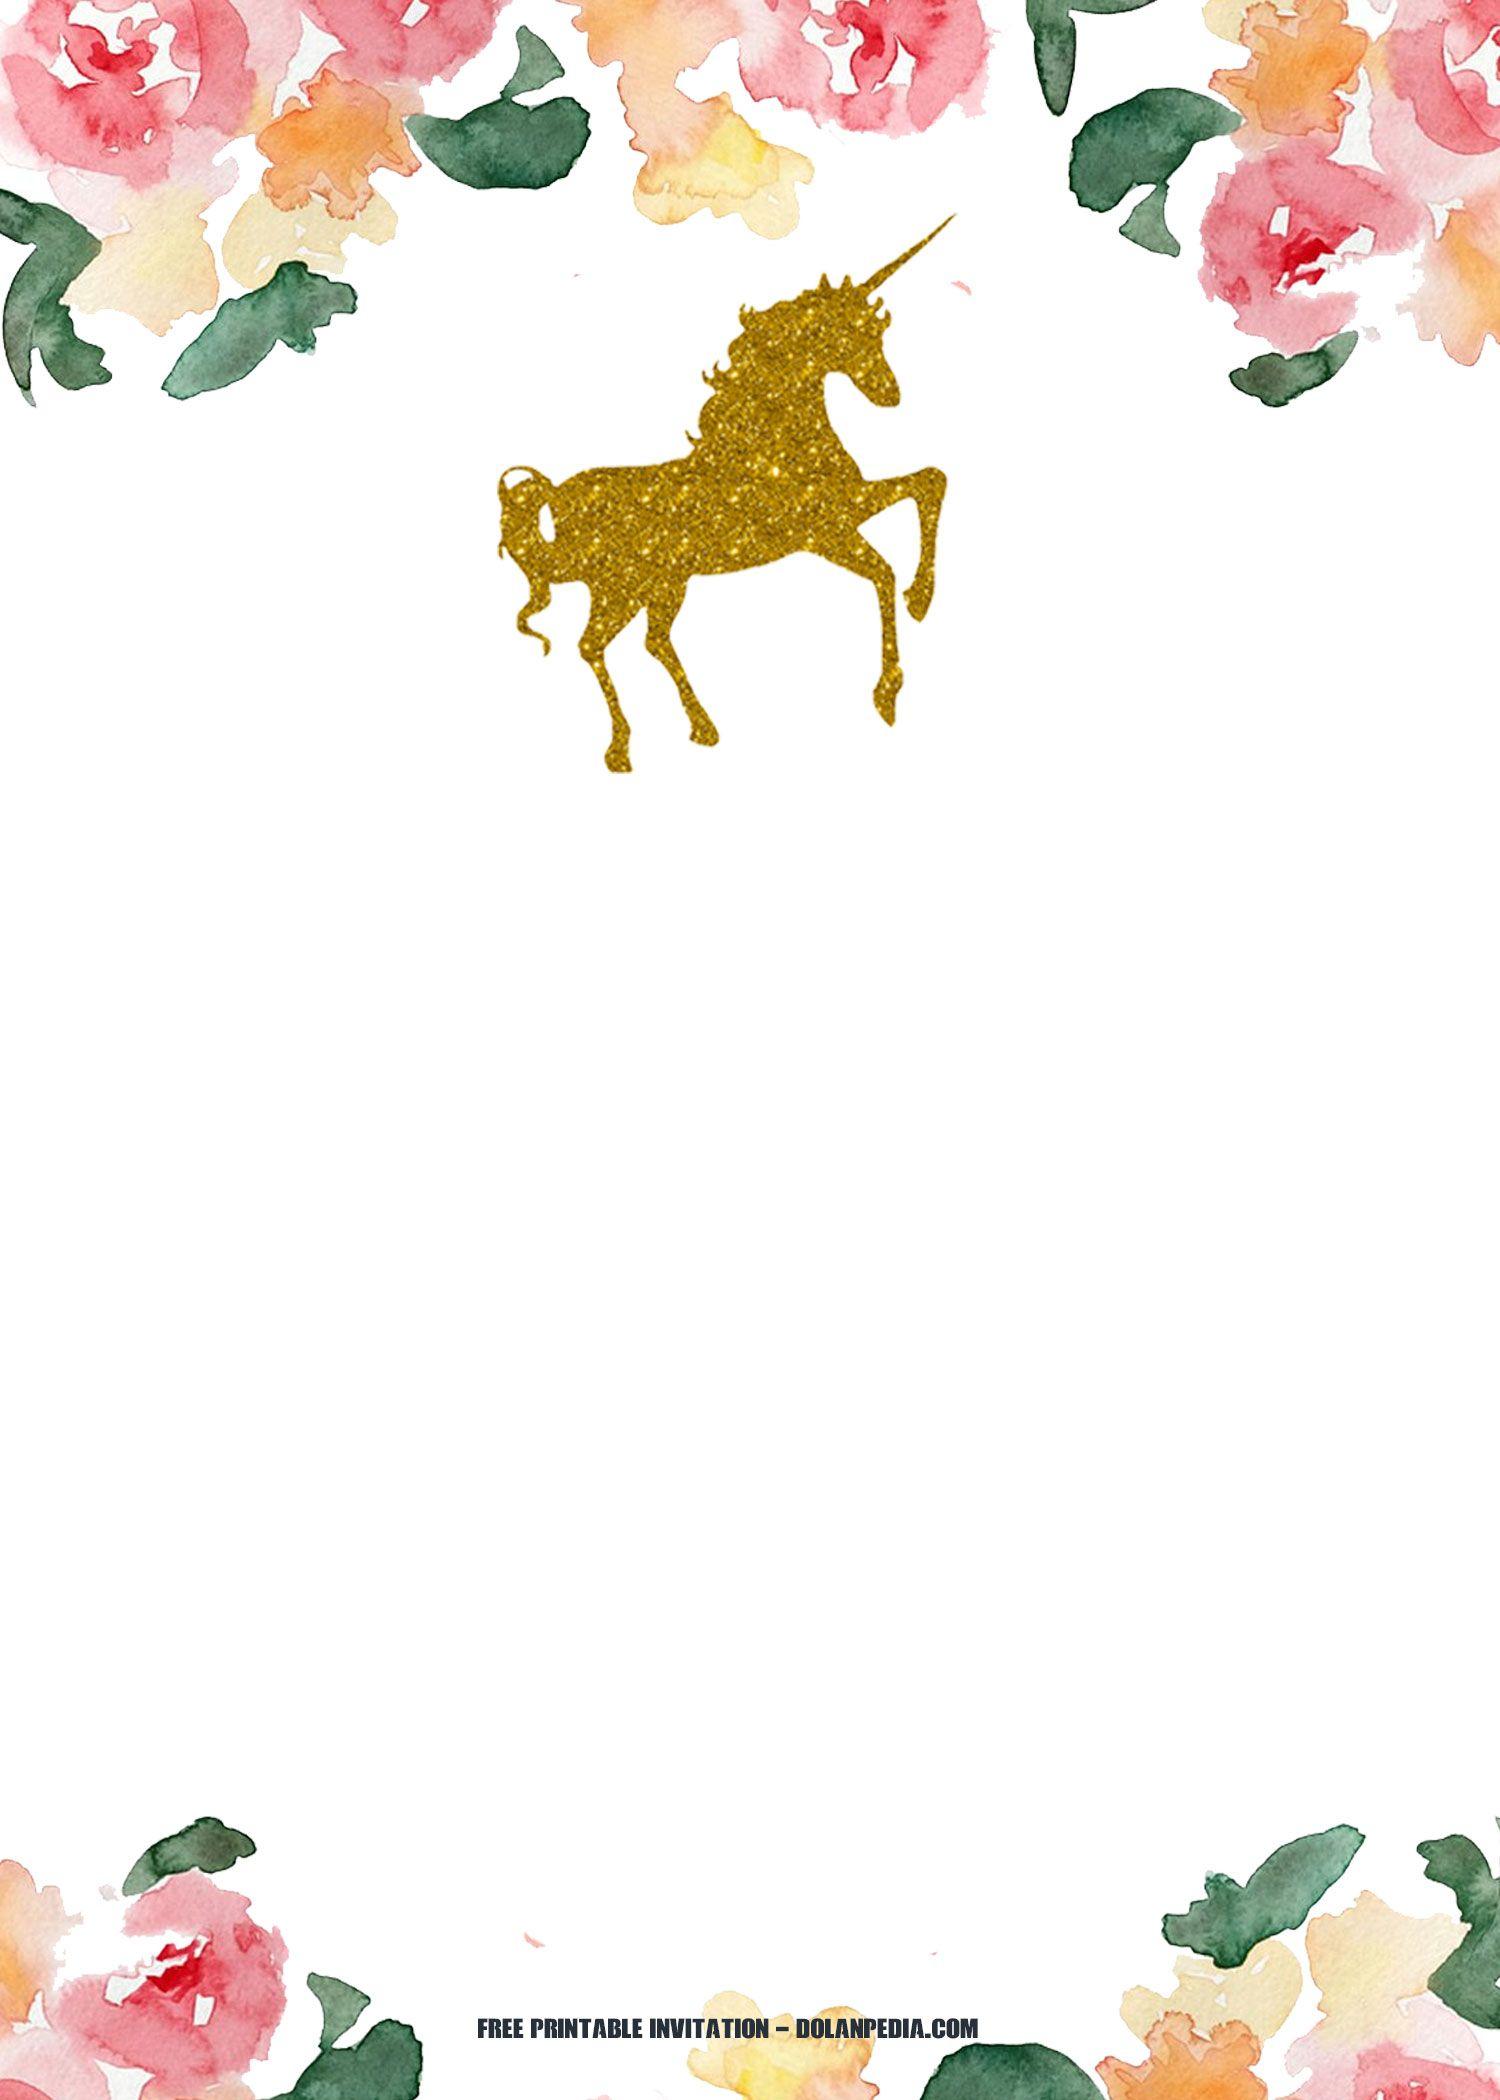 Free Printable Golden Unicorn Birthday Invitation | Birthday - Free Printable Unicorn Invitations